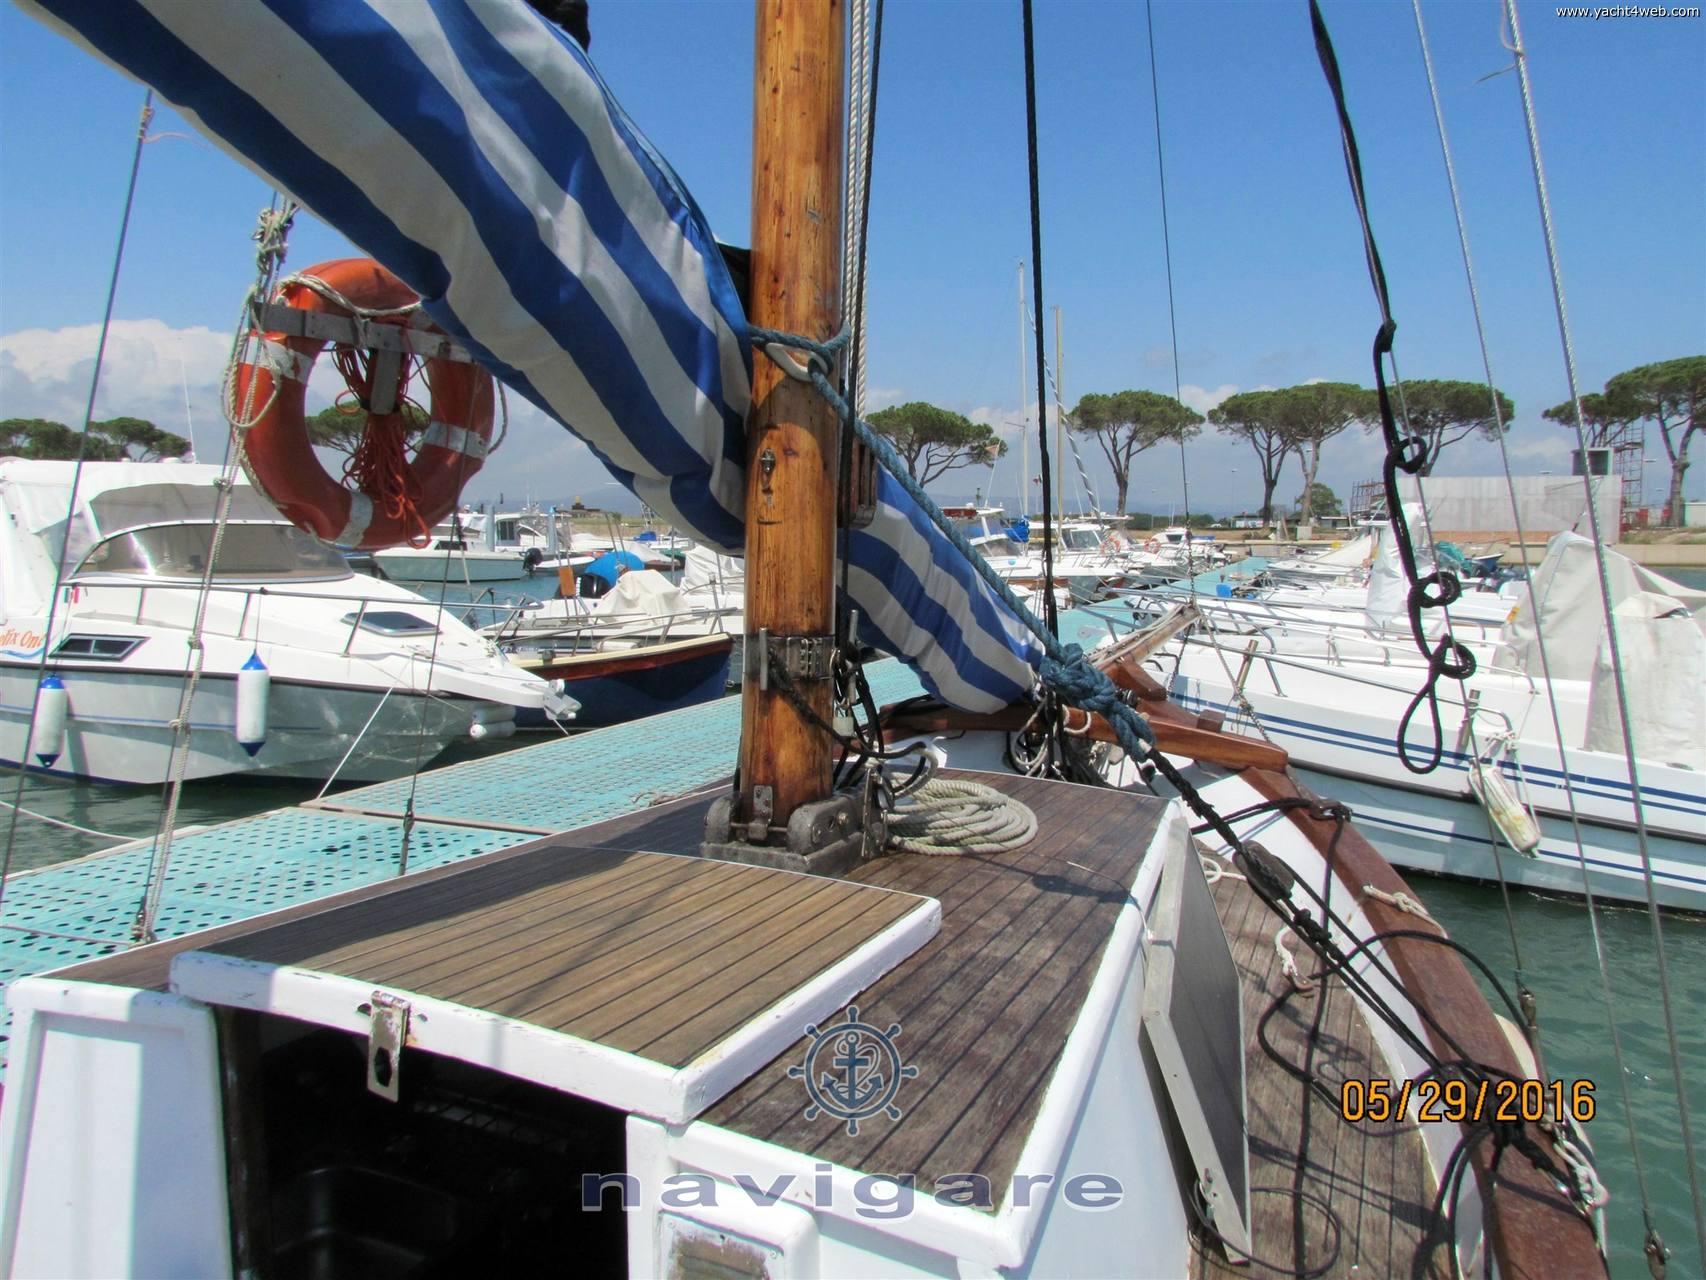 Galeazzi Palinuro barca a vela